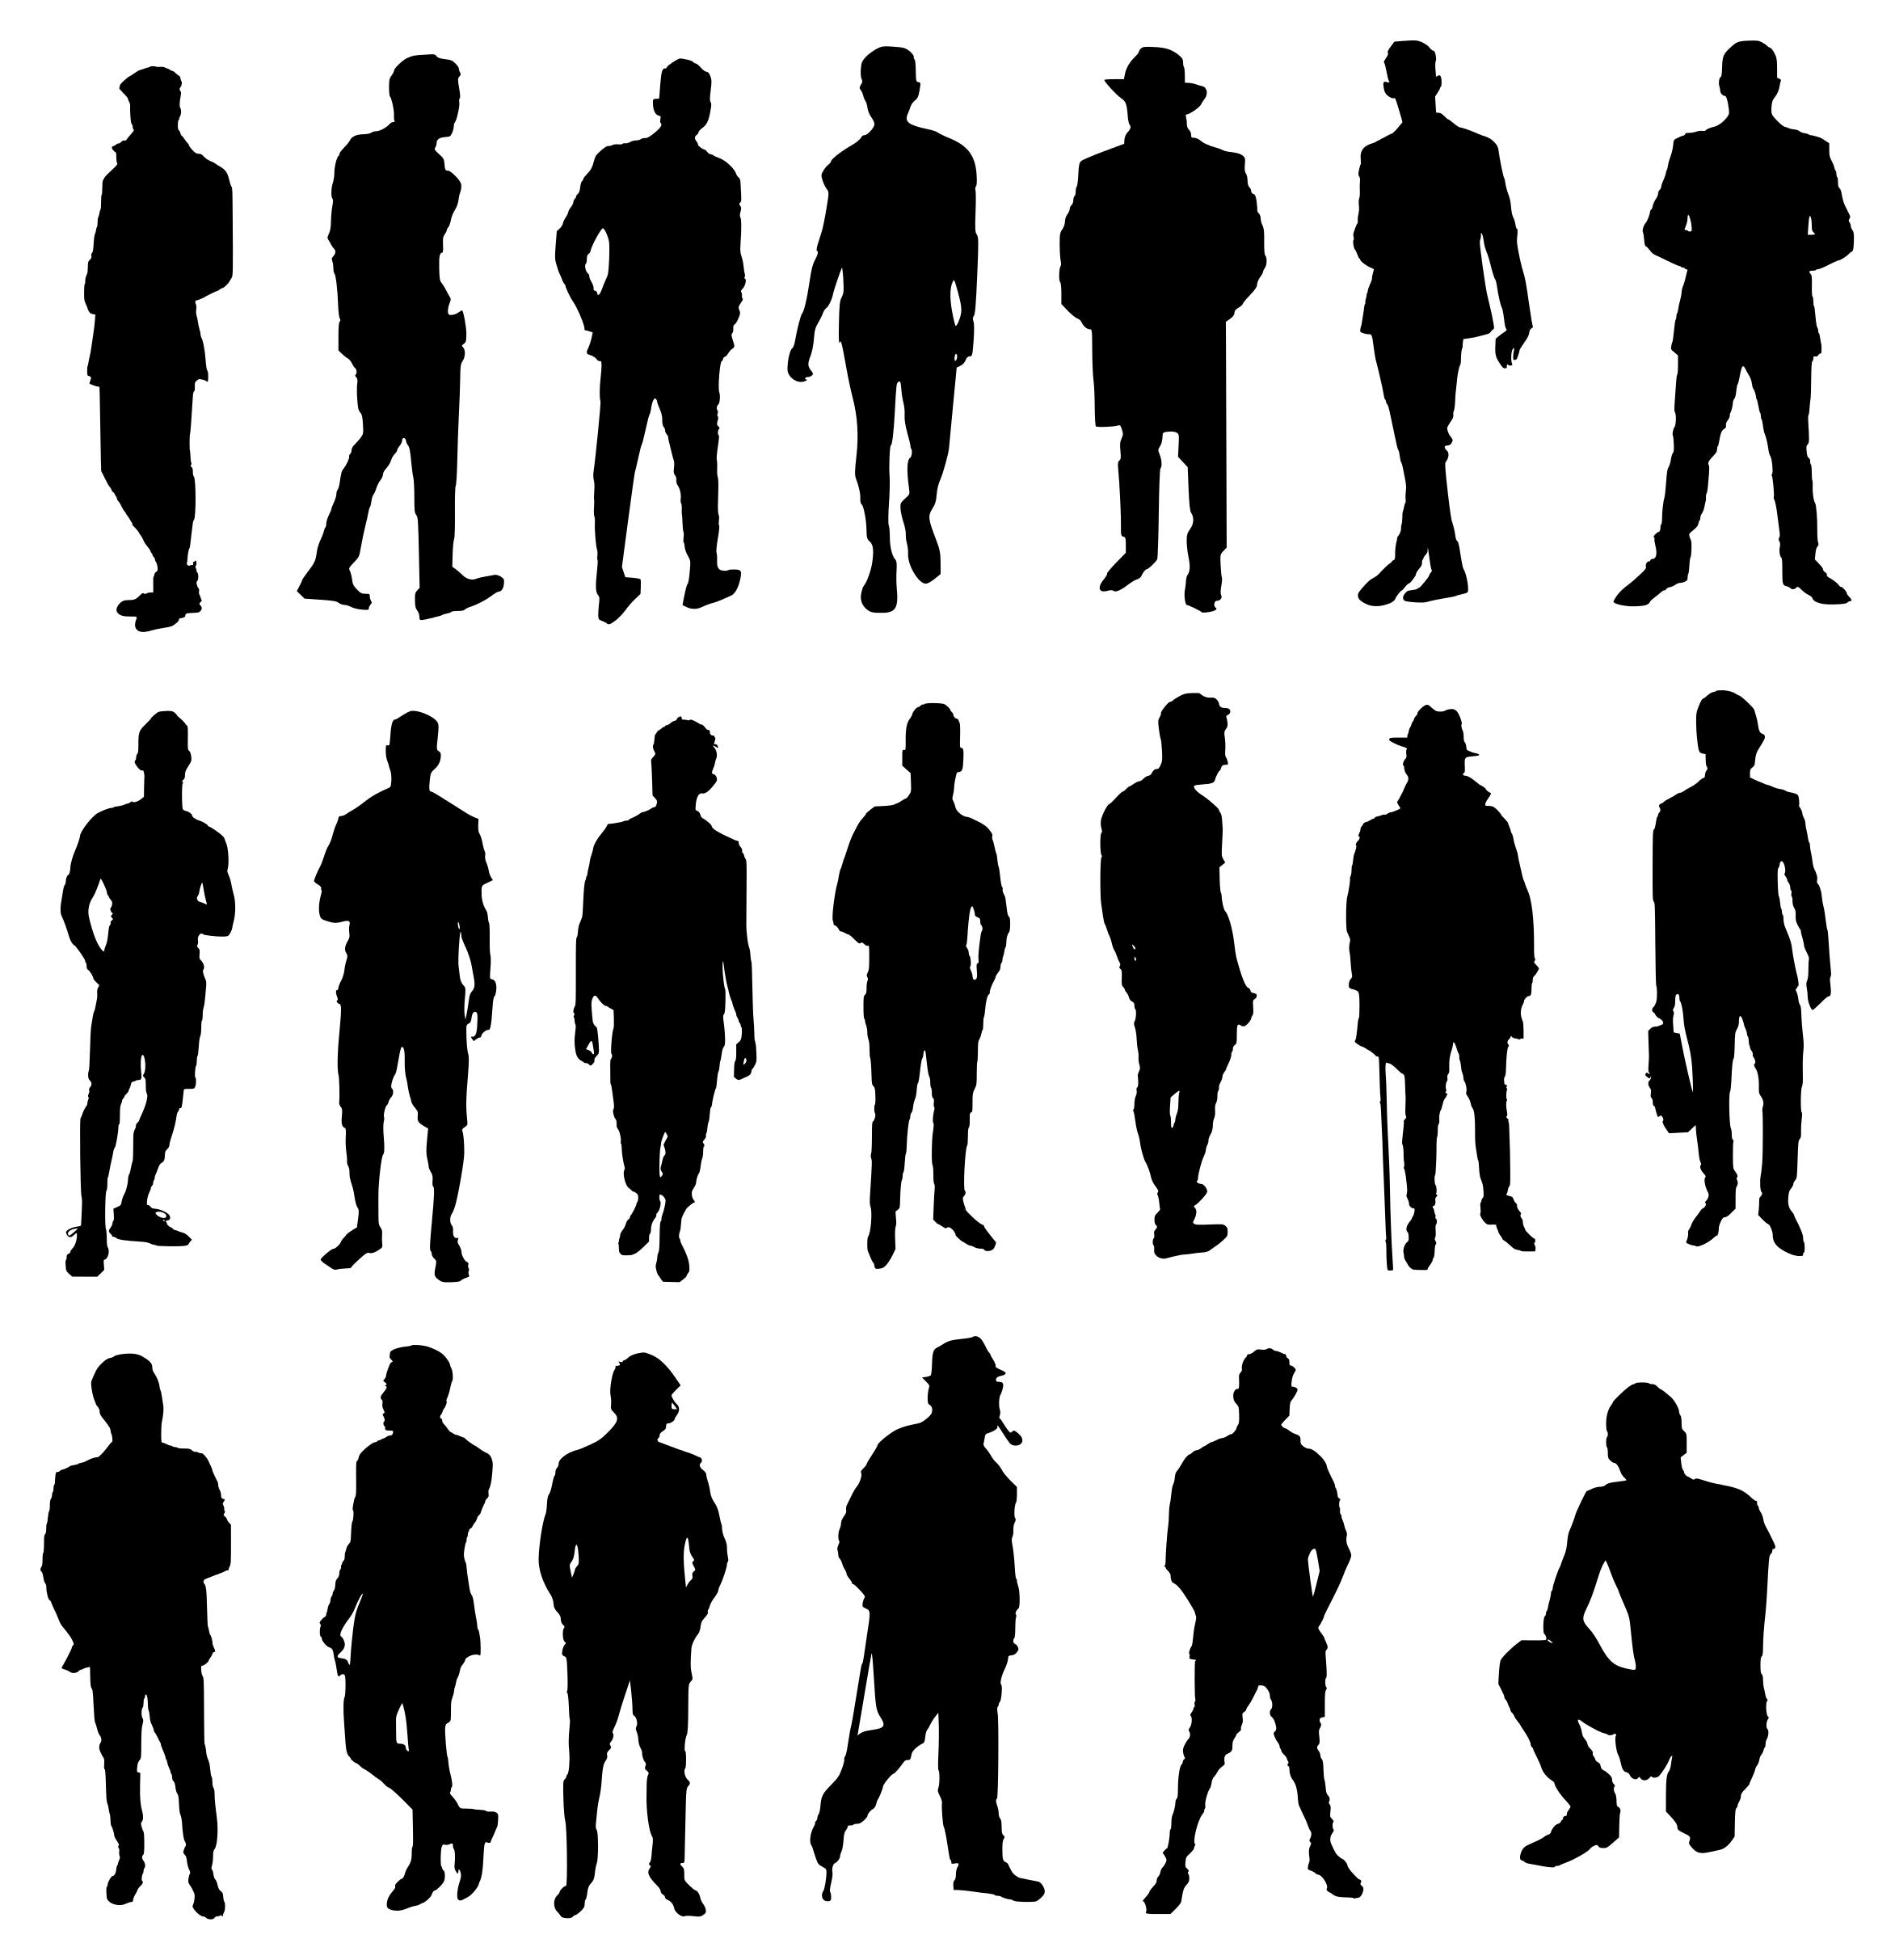 20 Man Silhouette (PNG Transparent).